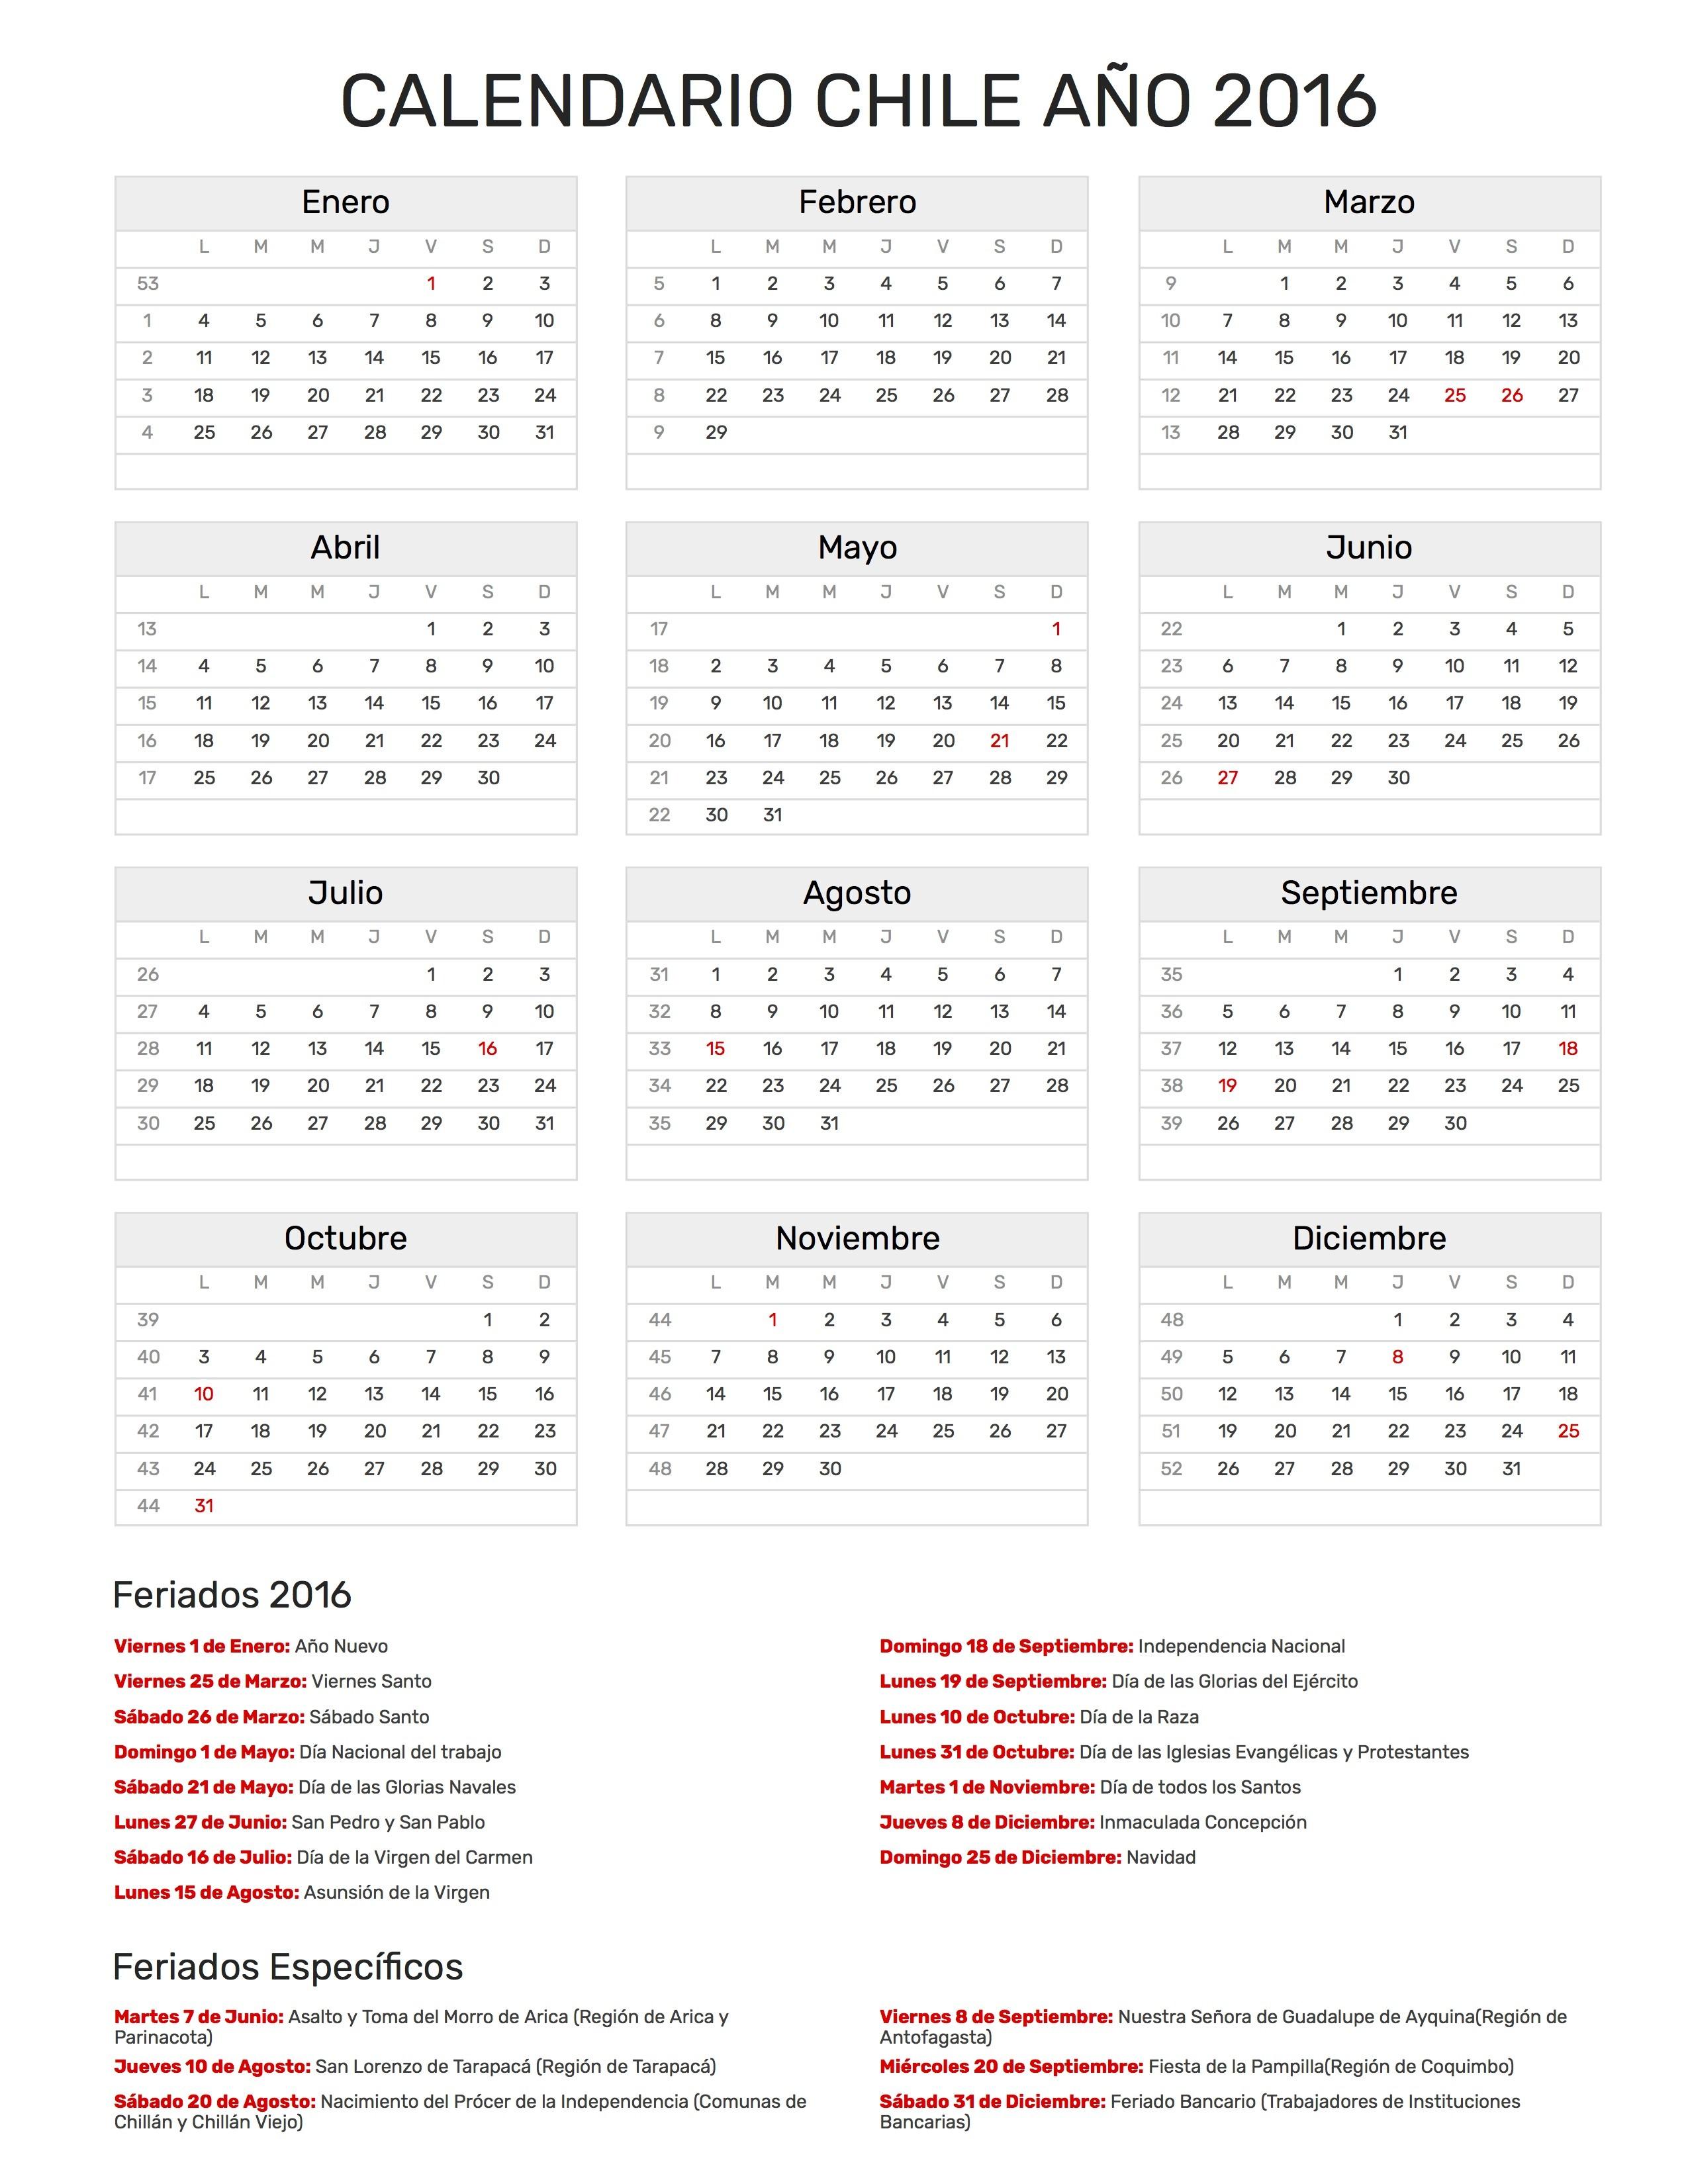 Calendario Chile 2016